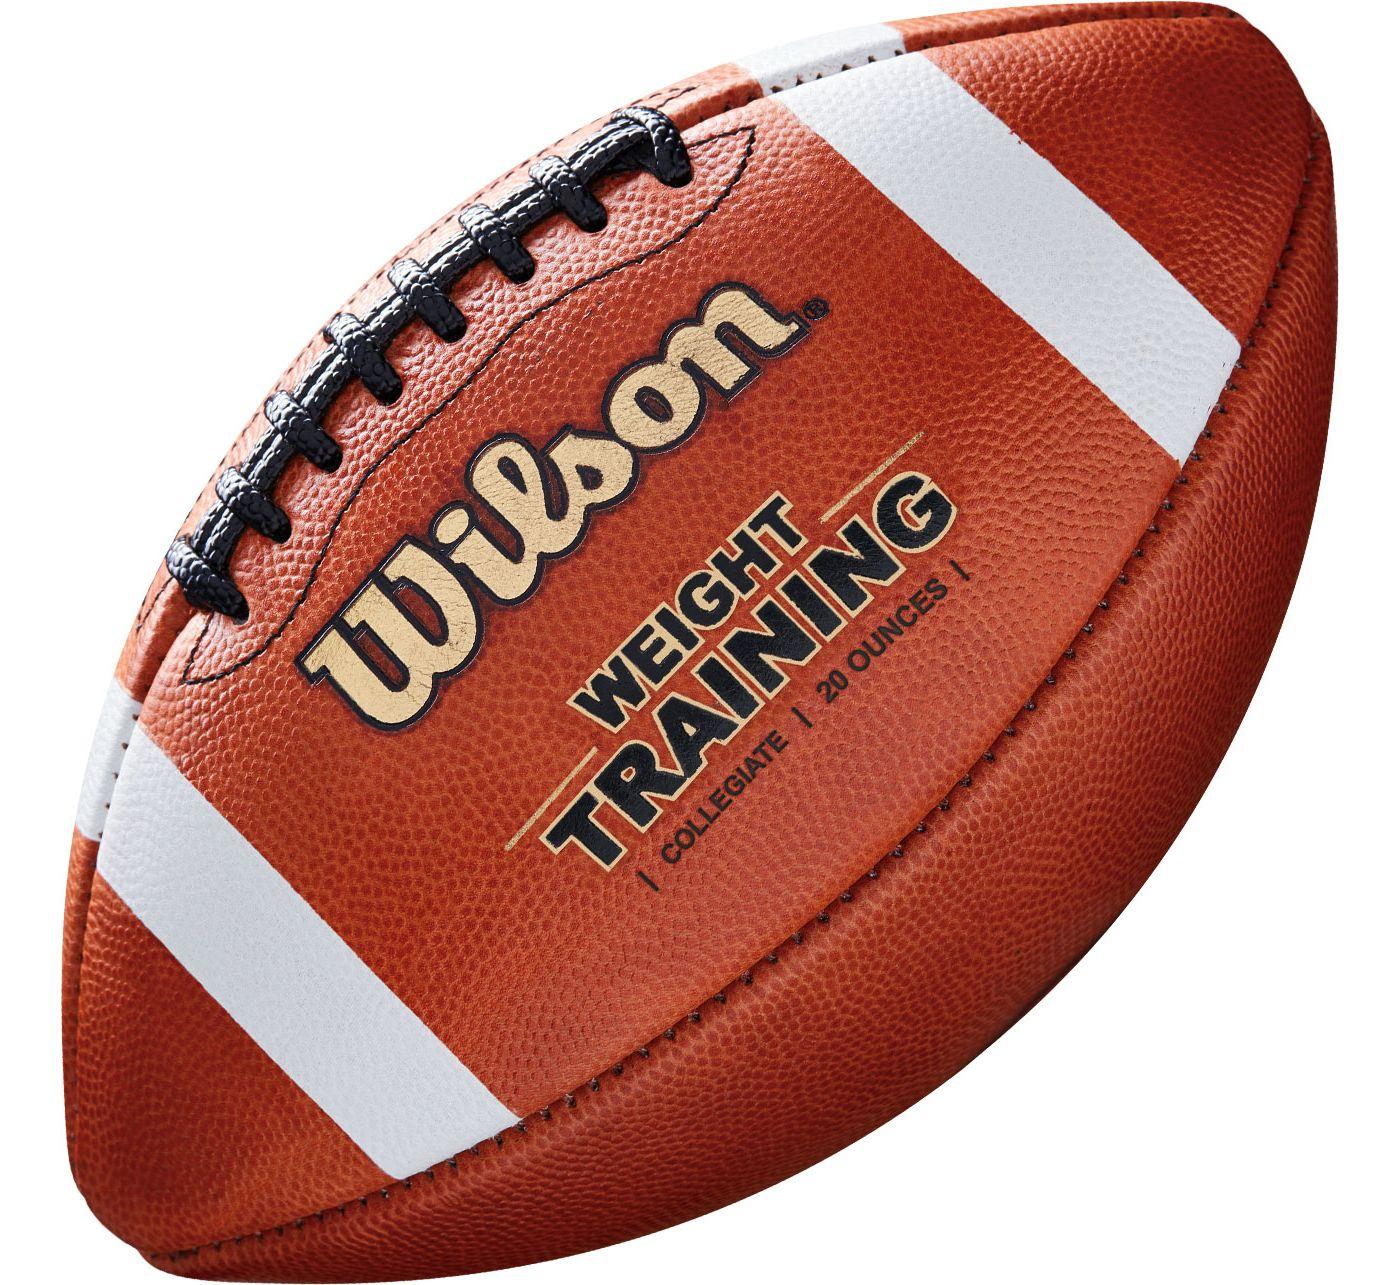 Wilson Weight Training Official Football